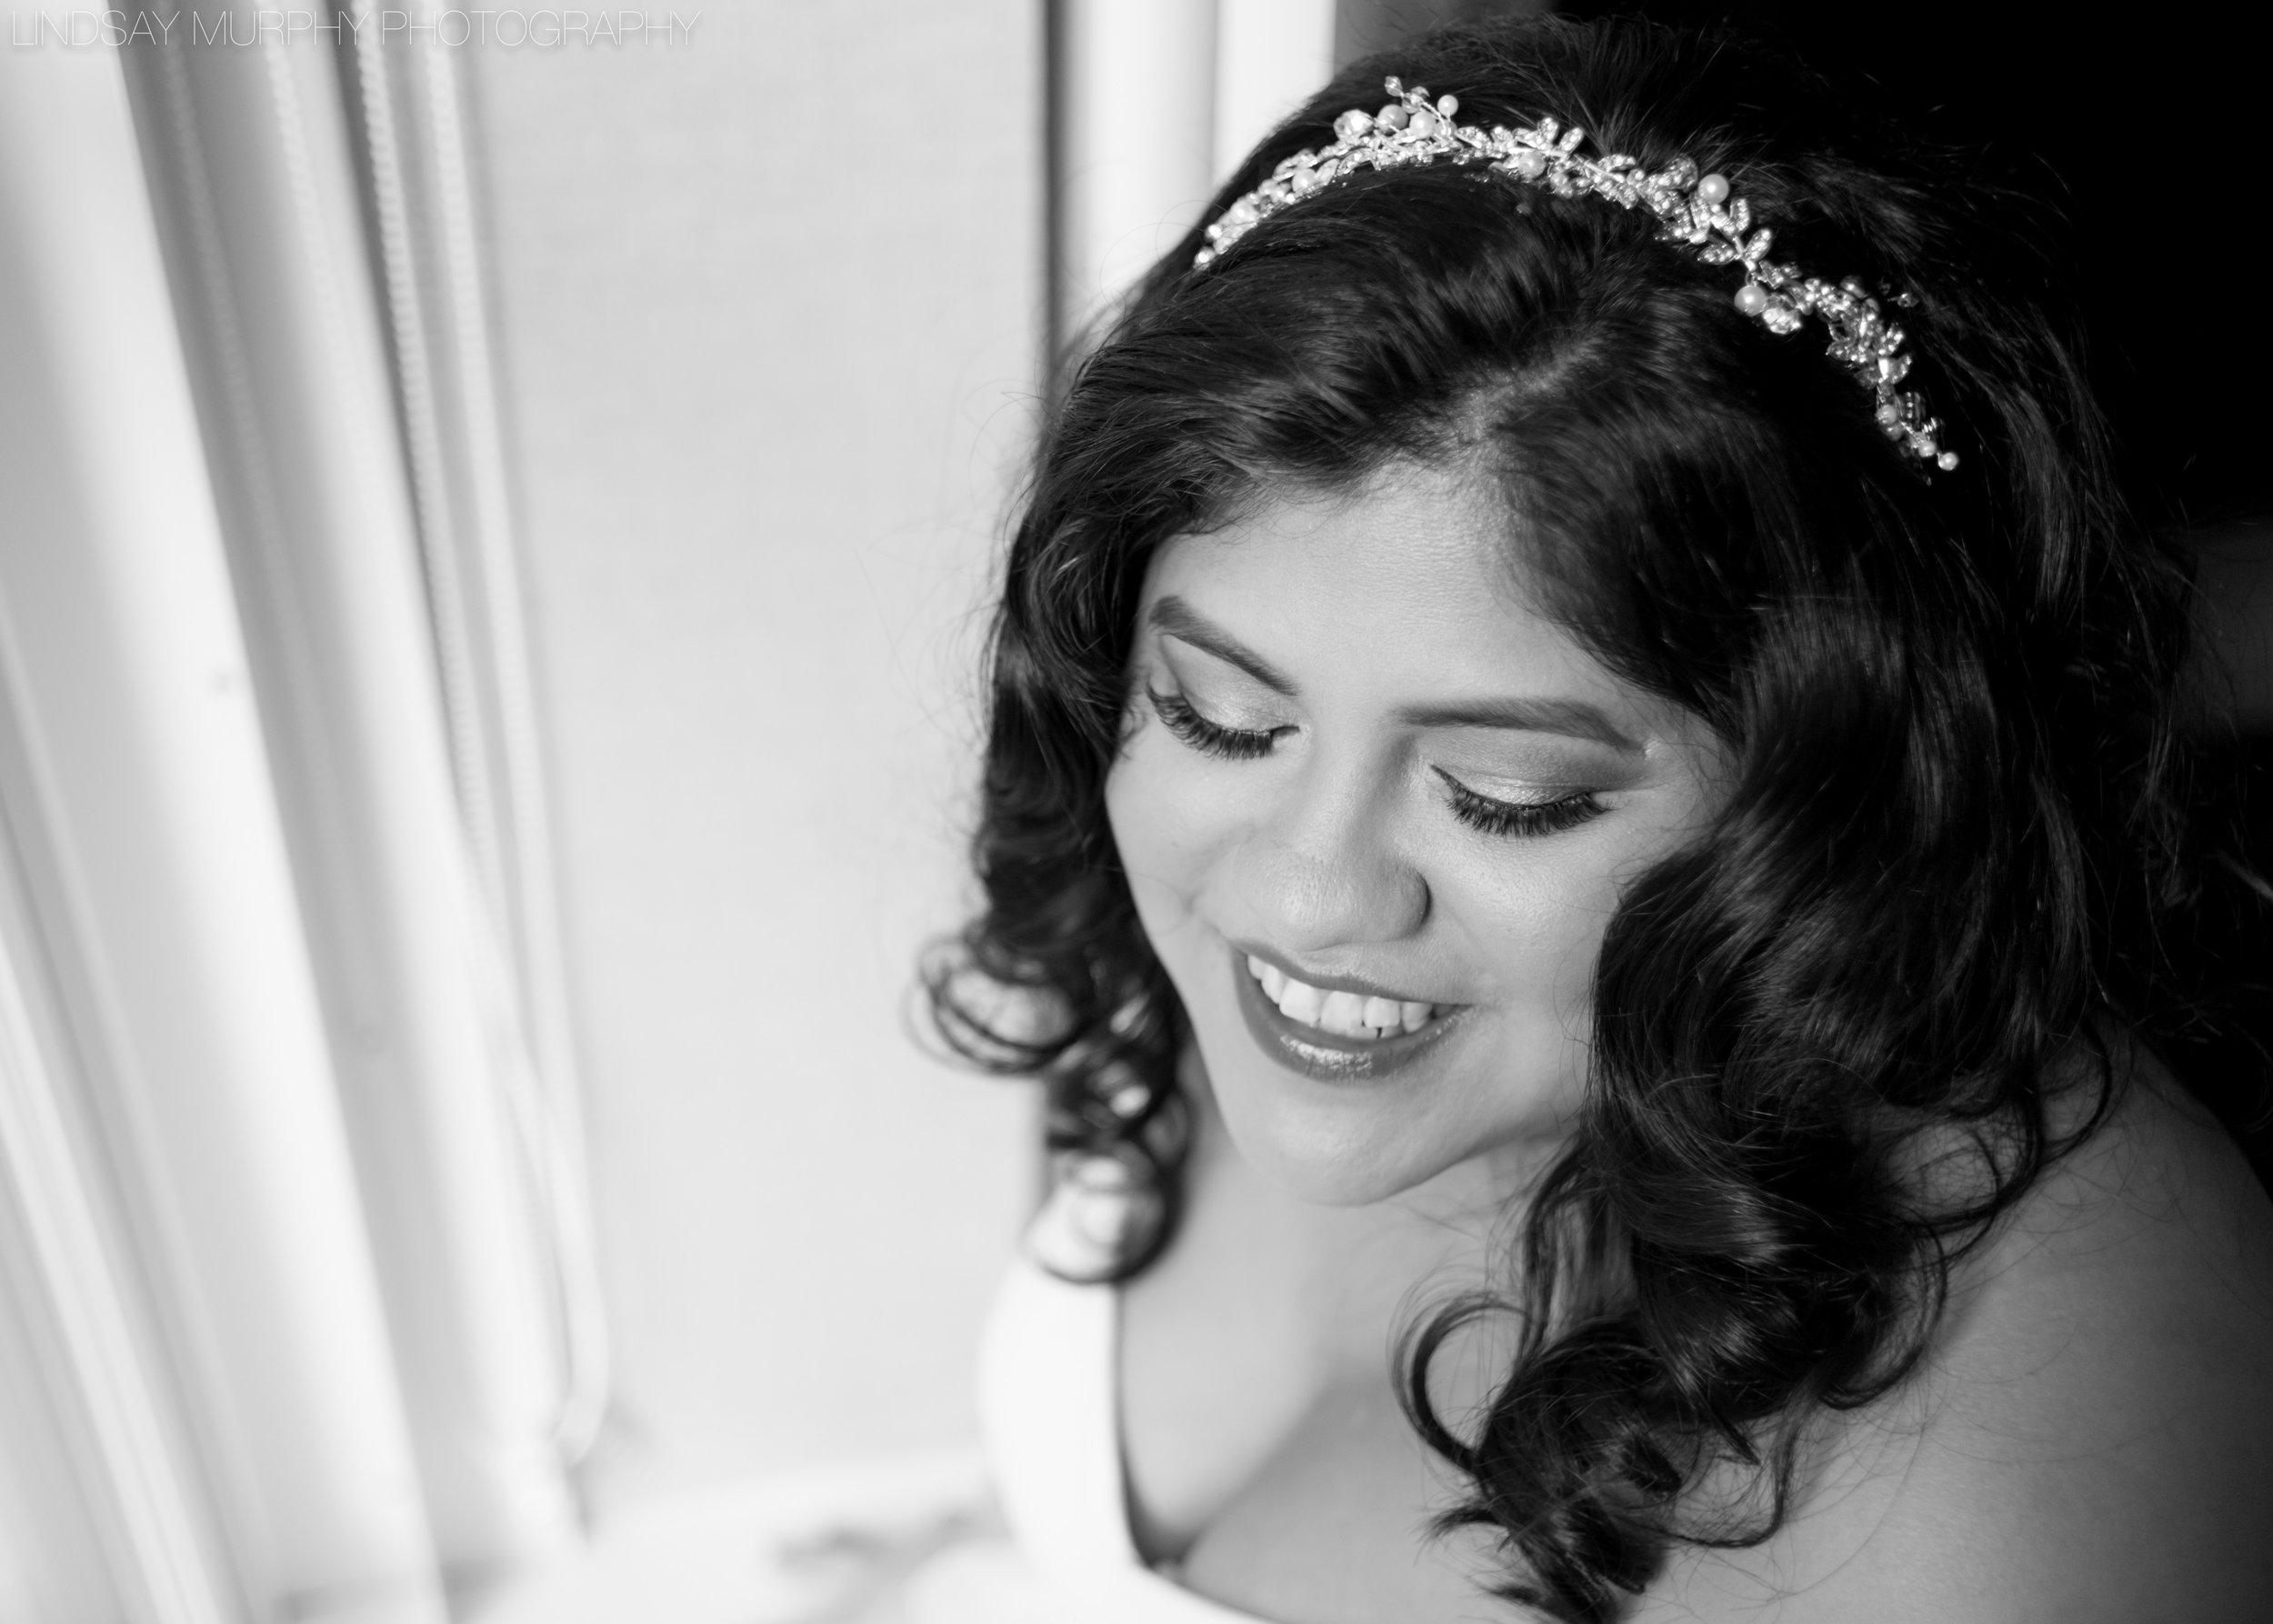 seattle_wedding_photography-26.jpg